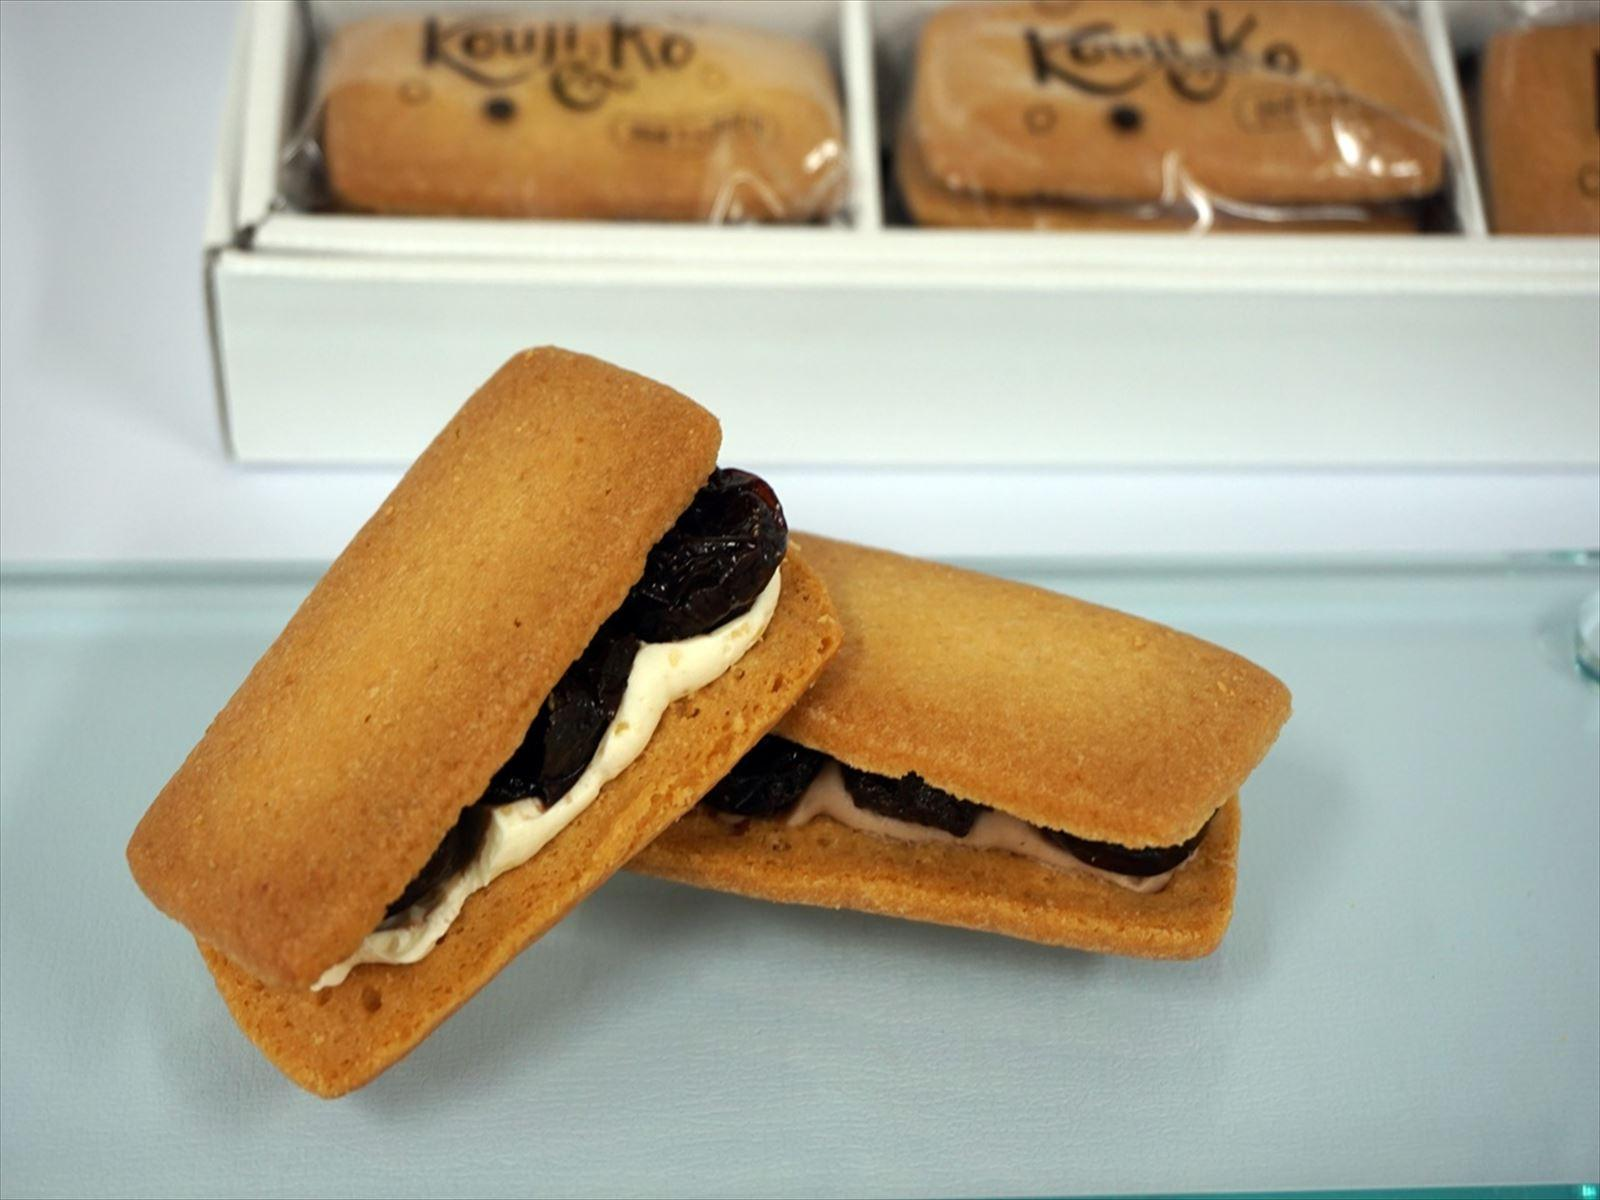 Kouji & ko(コウジアンドコー)山梨県産巨峰の発酵バターサンド